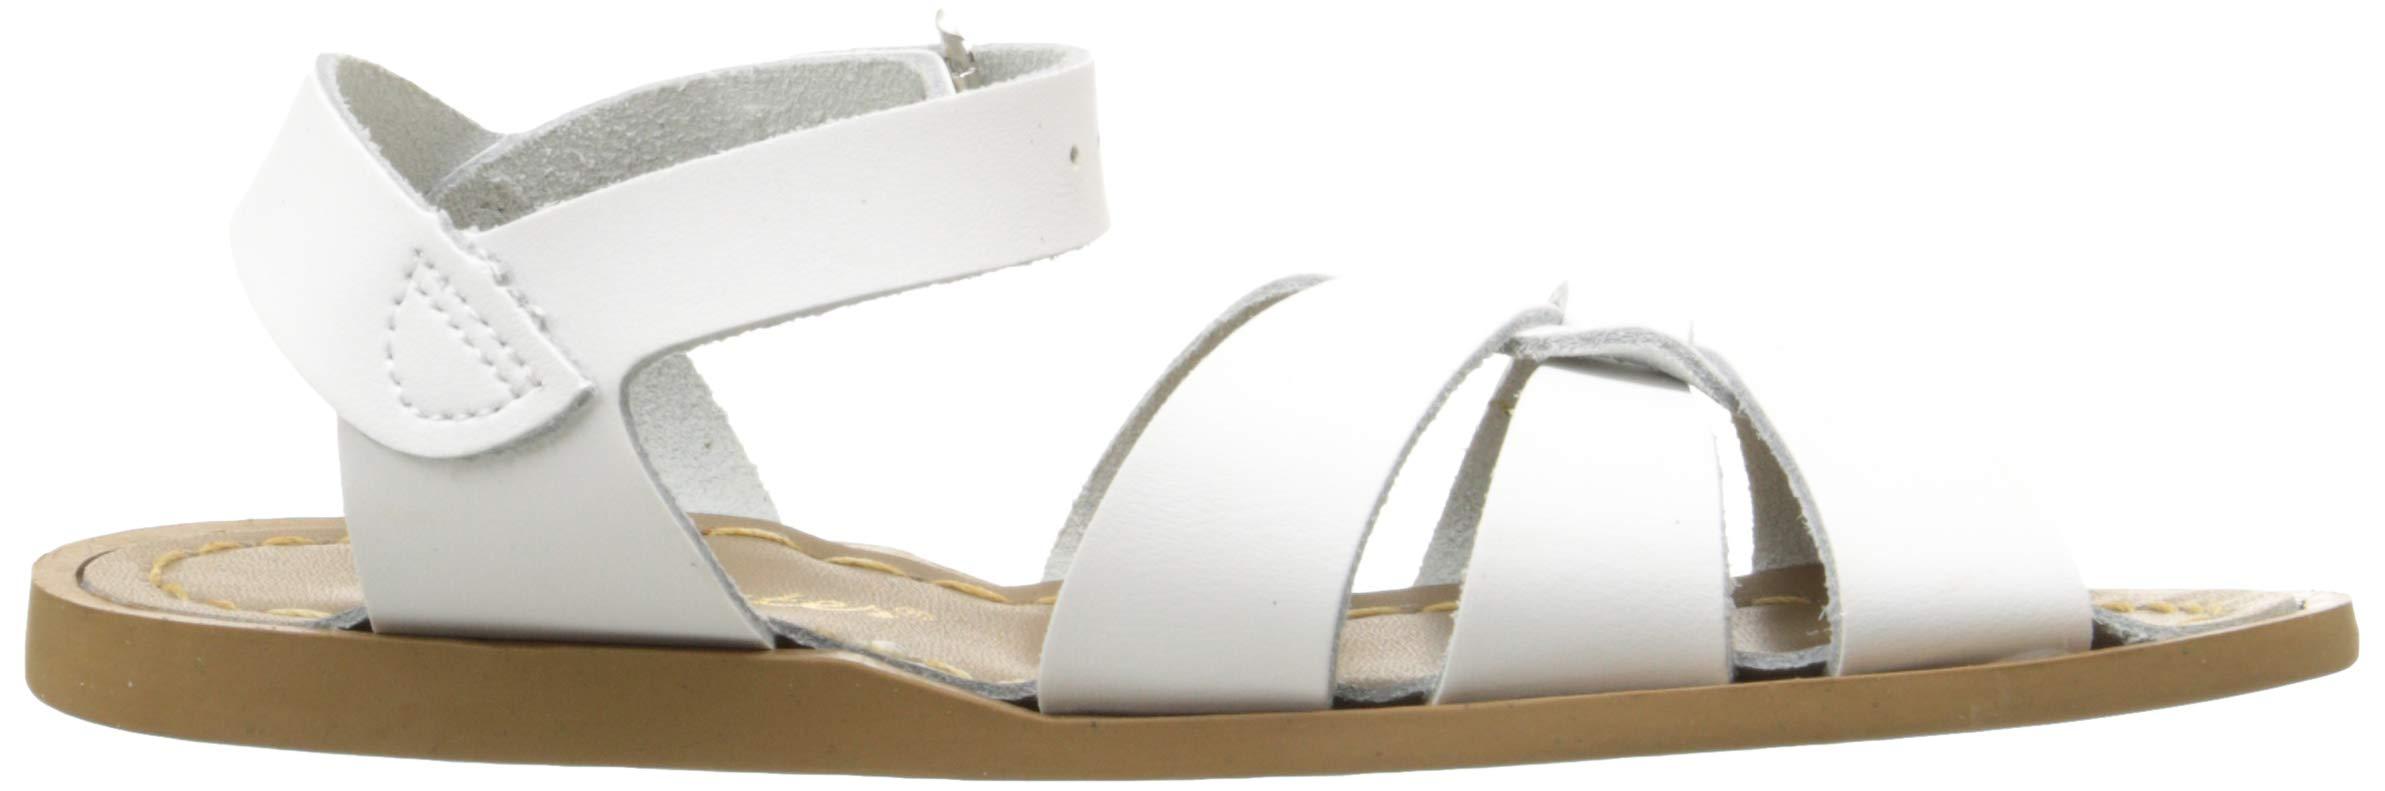 Salt Water Sandals by Hoy Shoe Original Sandal (Toddler/Little Kid/Big Kid/Women's), White, 13 M US Little Kid by Salt Water Sandals (Image #7)